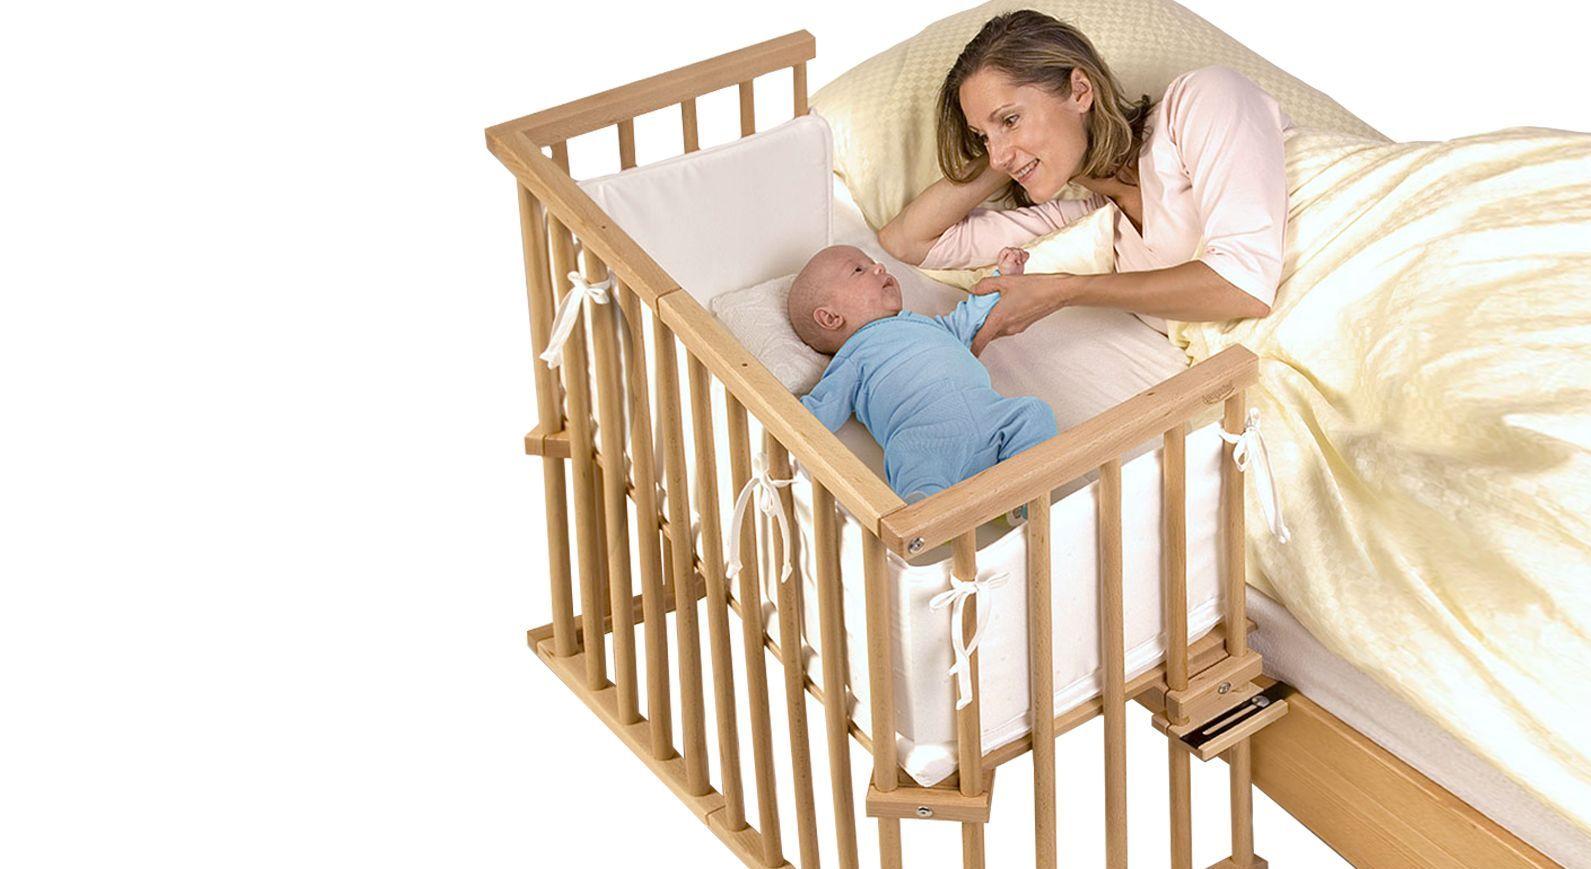 Anstellbettchen BabyBay Midi aus stabilem Echtholz